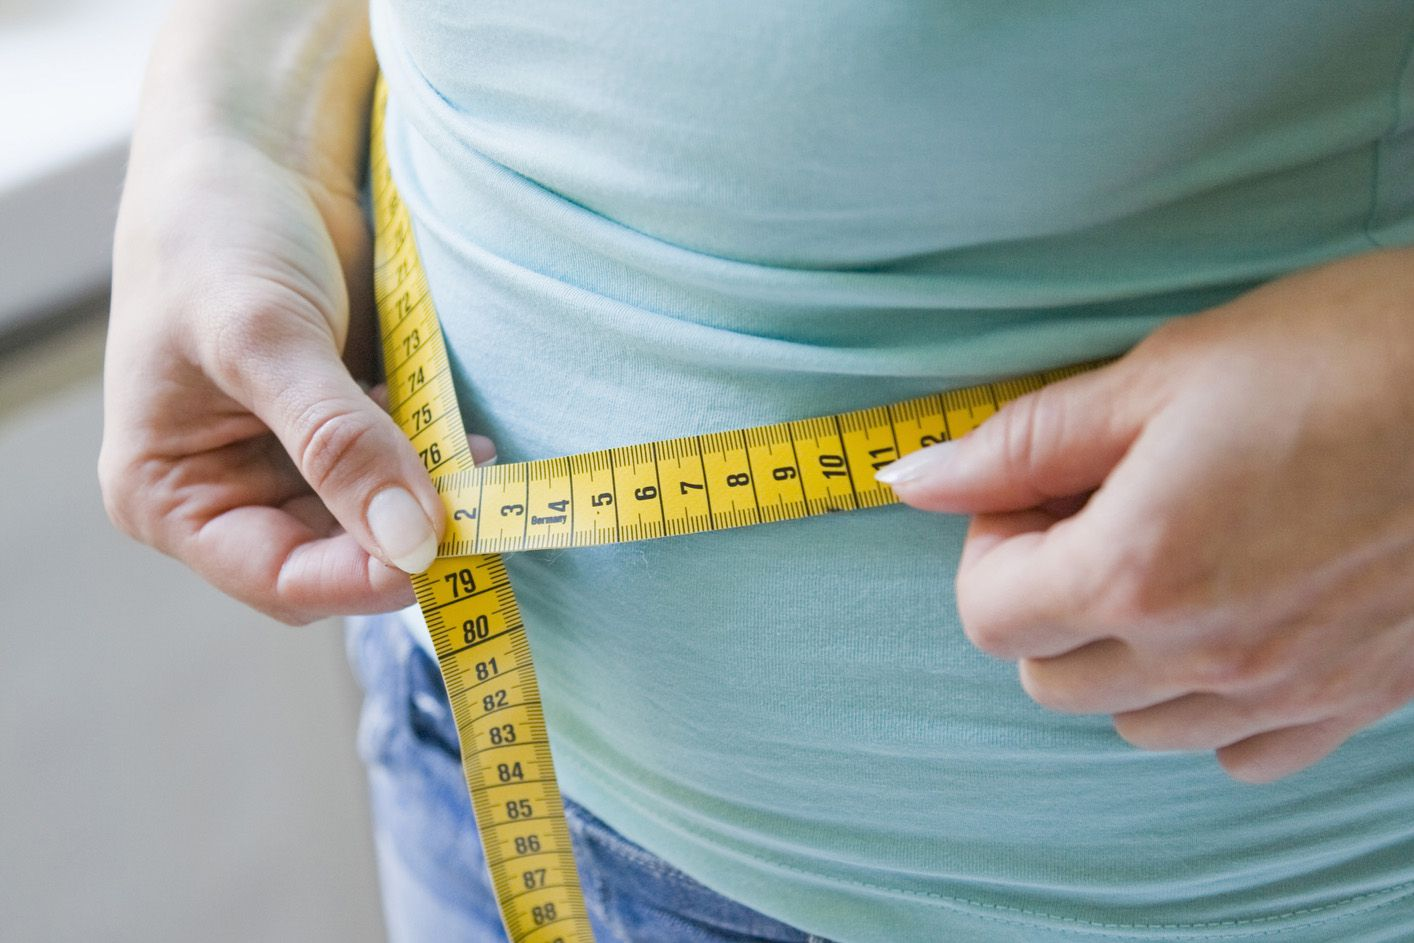 measuring-waist-GettyImages-84057051-58078ea33df78cbc2840c4c5.jpg